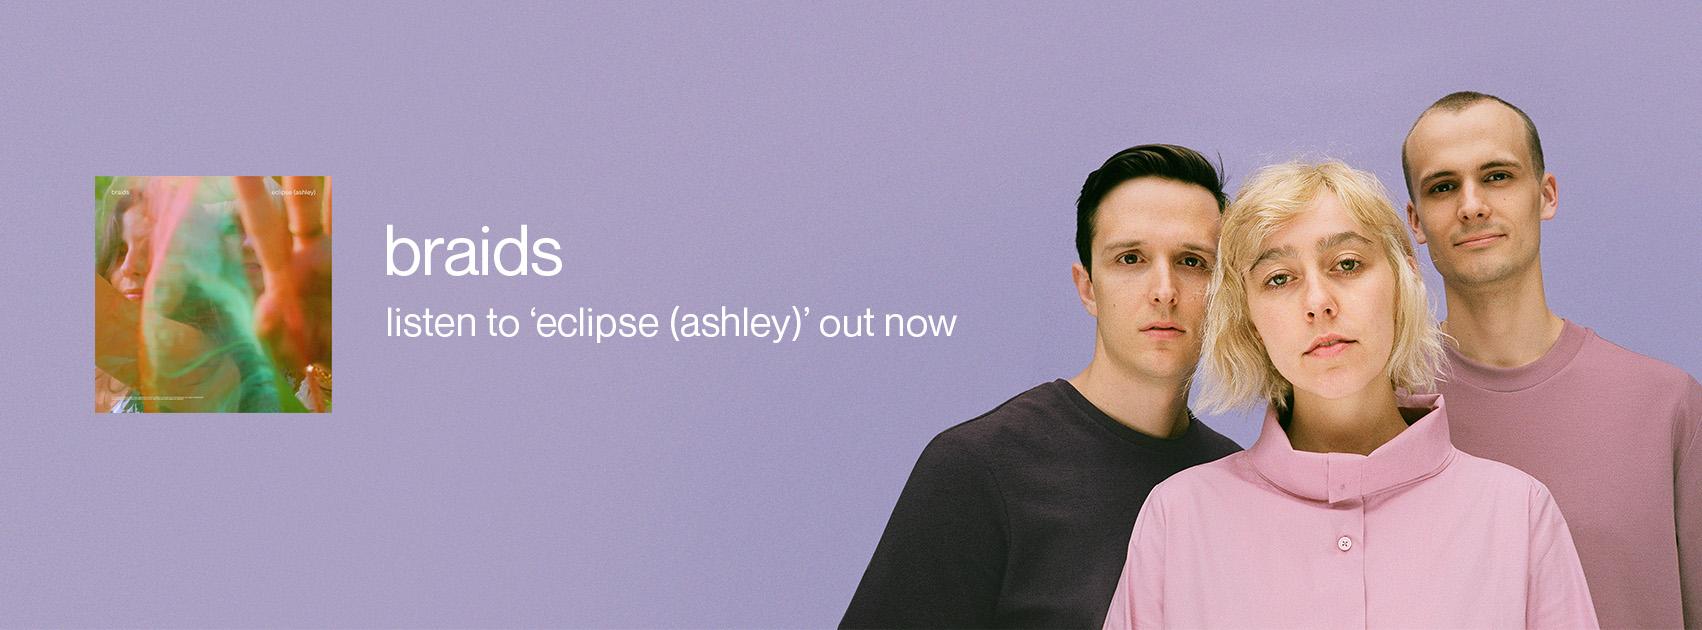 Braids eclipse (Ashley)